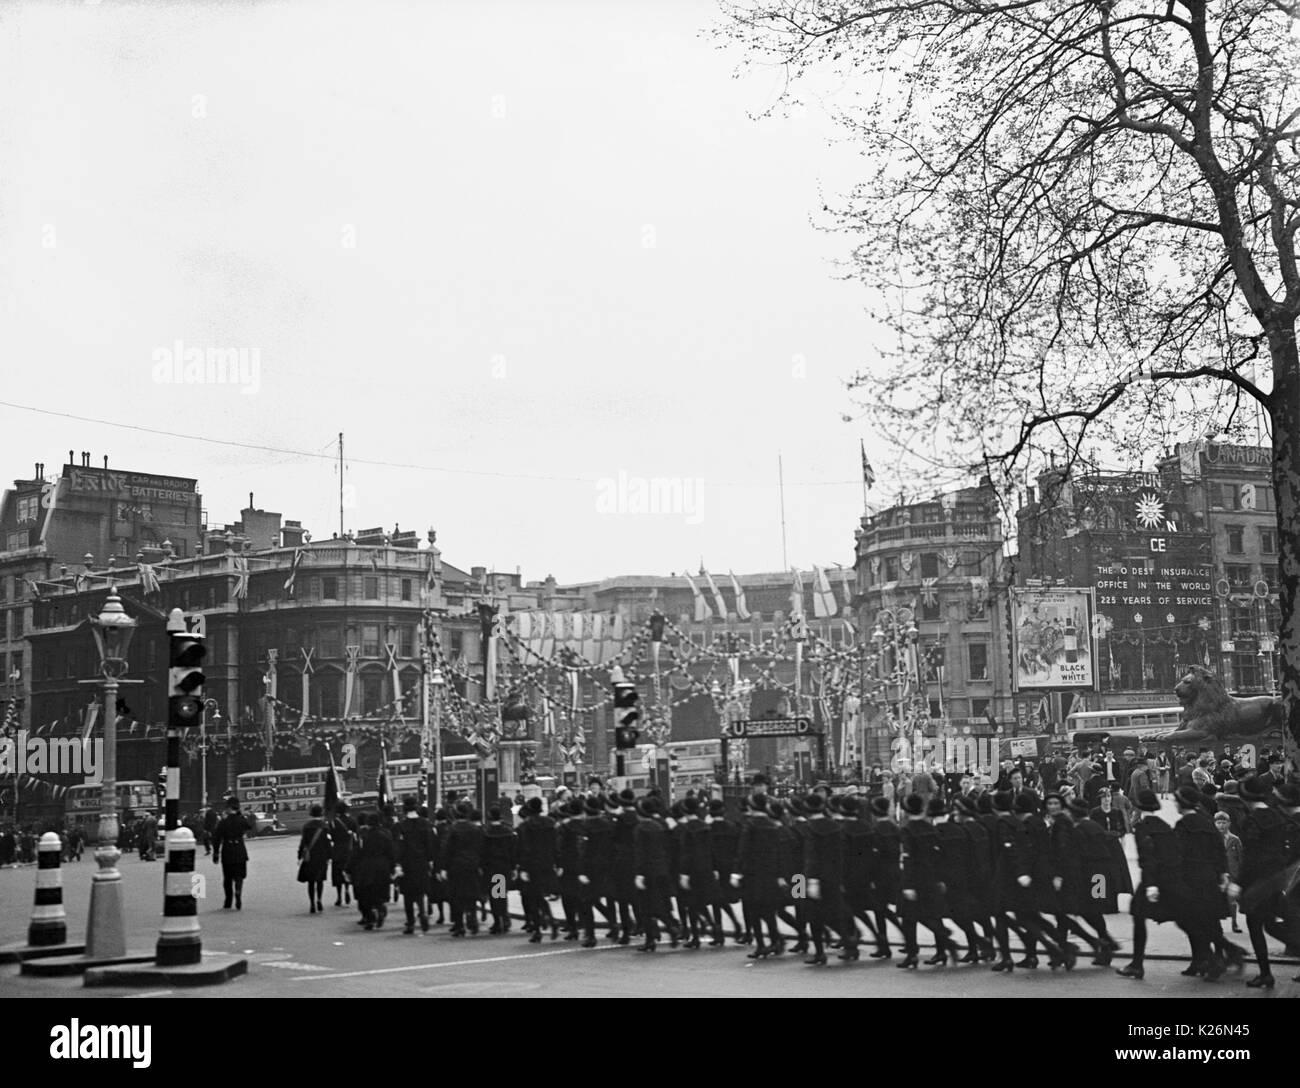 AJAXNETPHOTO. 1935. LONDON, ENGLAND. - TRAFALGAR SQUARE PROCESSION DURING JUBILEE CELEBRATIONS.PHOTO:T.J.SPOONER COLL/AJAX VINTAGE PICTURE LIBRARY REF; ()AVL_GBR_LONDON_TJS1935_02 - Stock Image